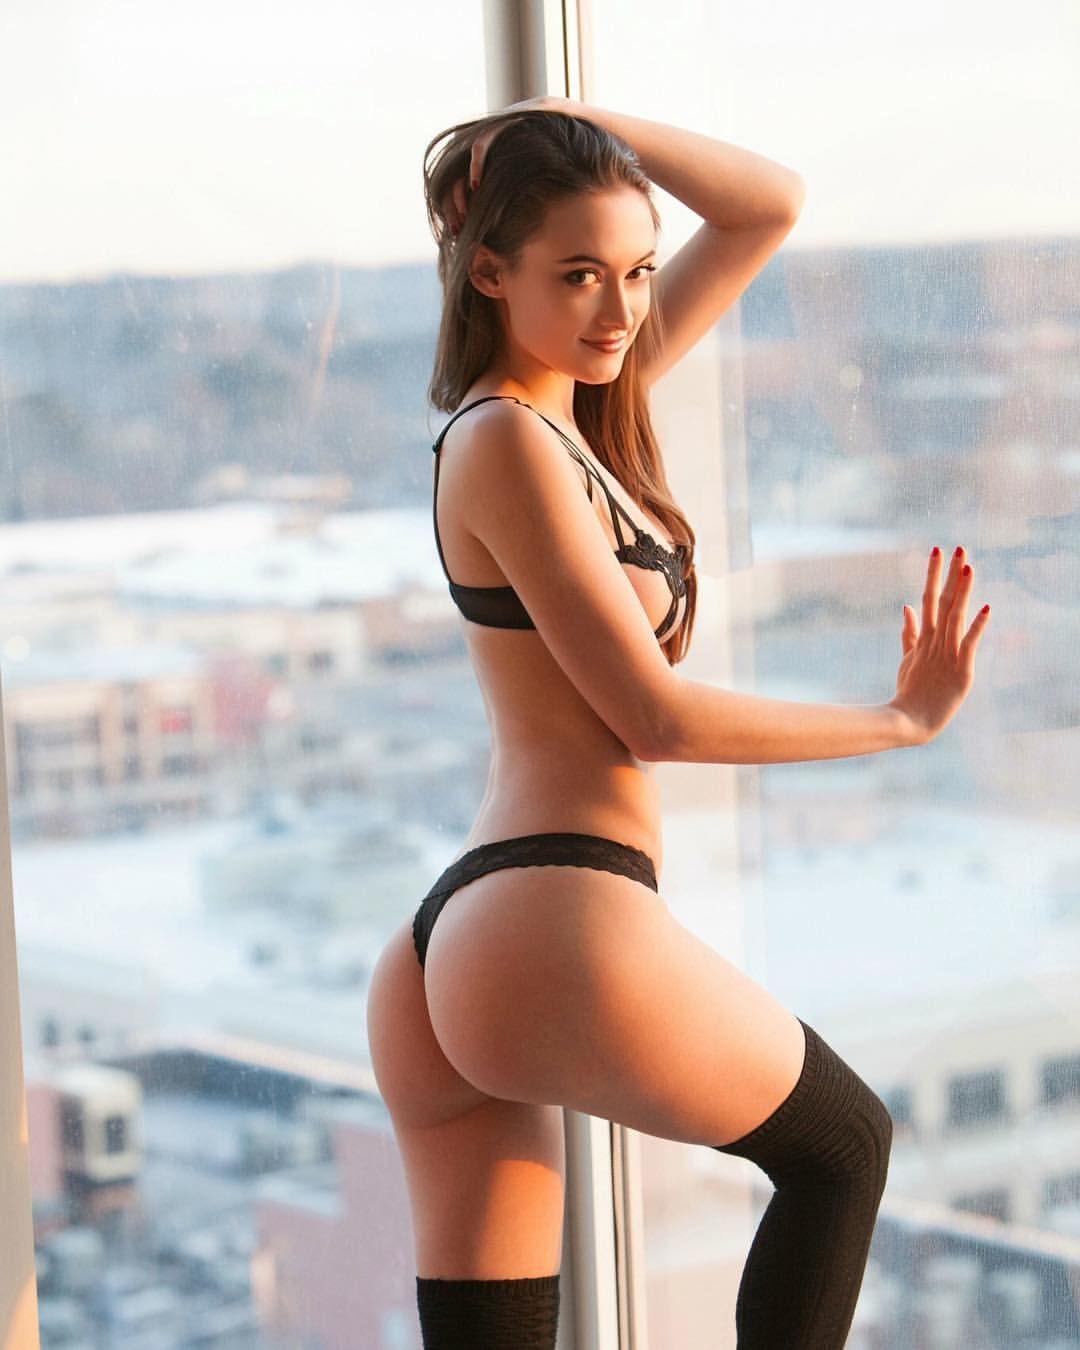 Hacked Deanna Greene nudes (57 photos), Sideboobs